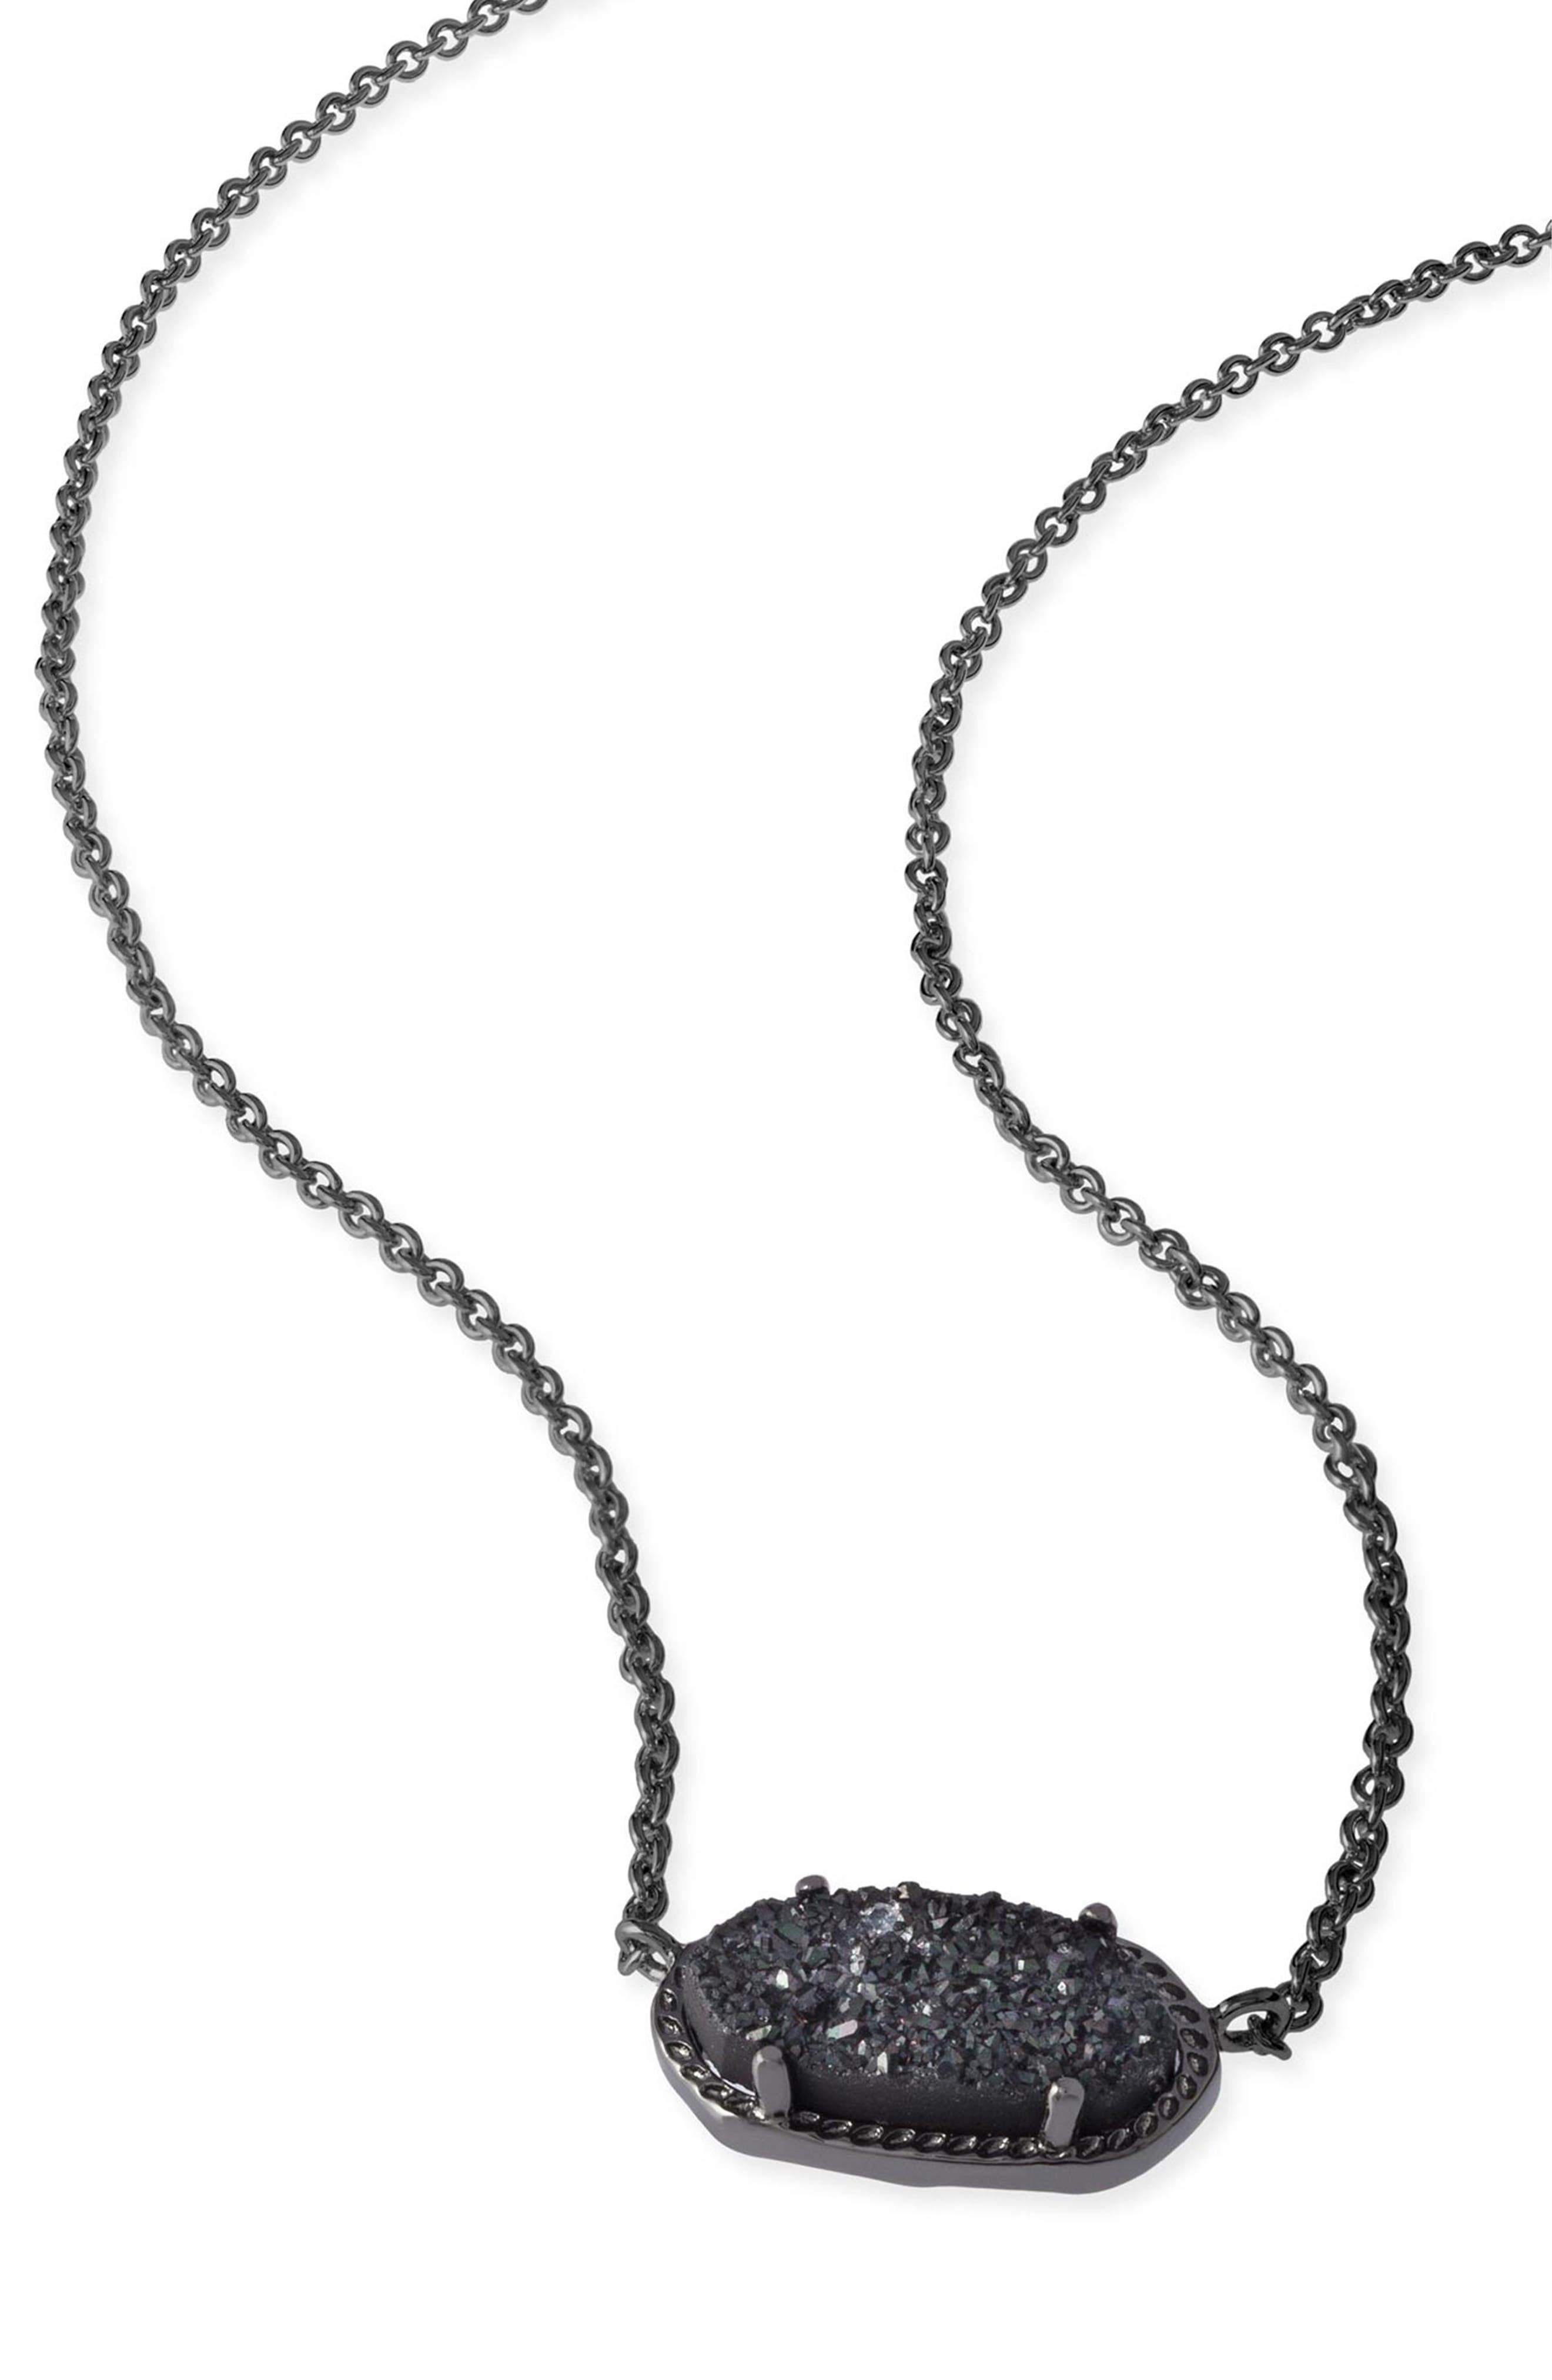 Elisa Filigree Pendant Necklace,                             Alternate thumbnail 3, color,                             GUNMETAL/ BLACK DRUSY